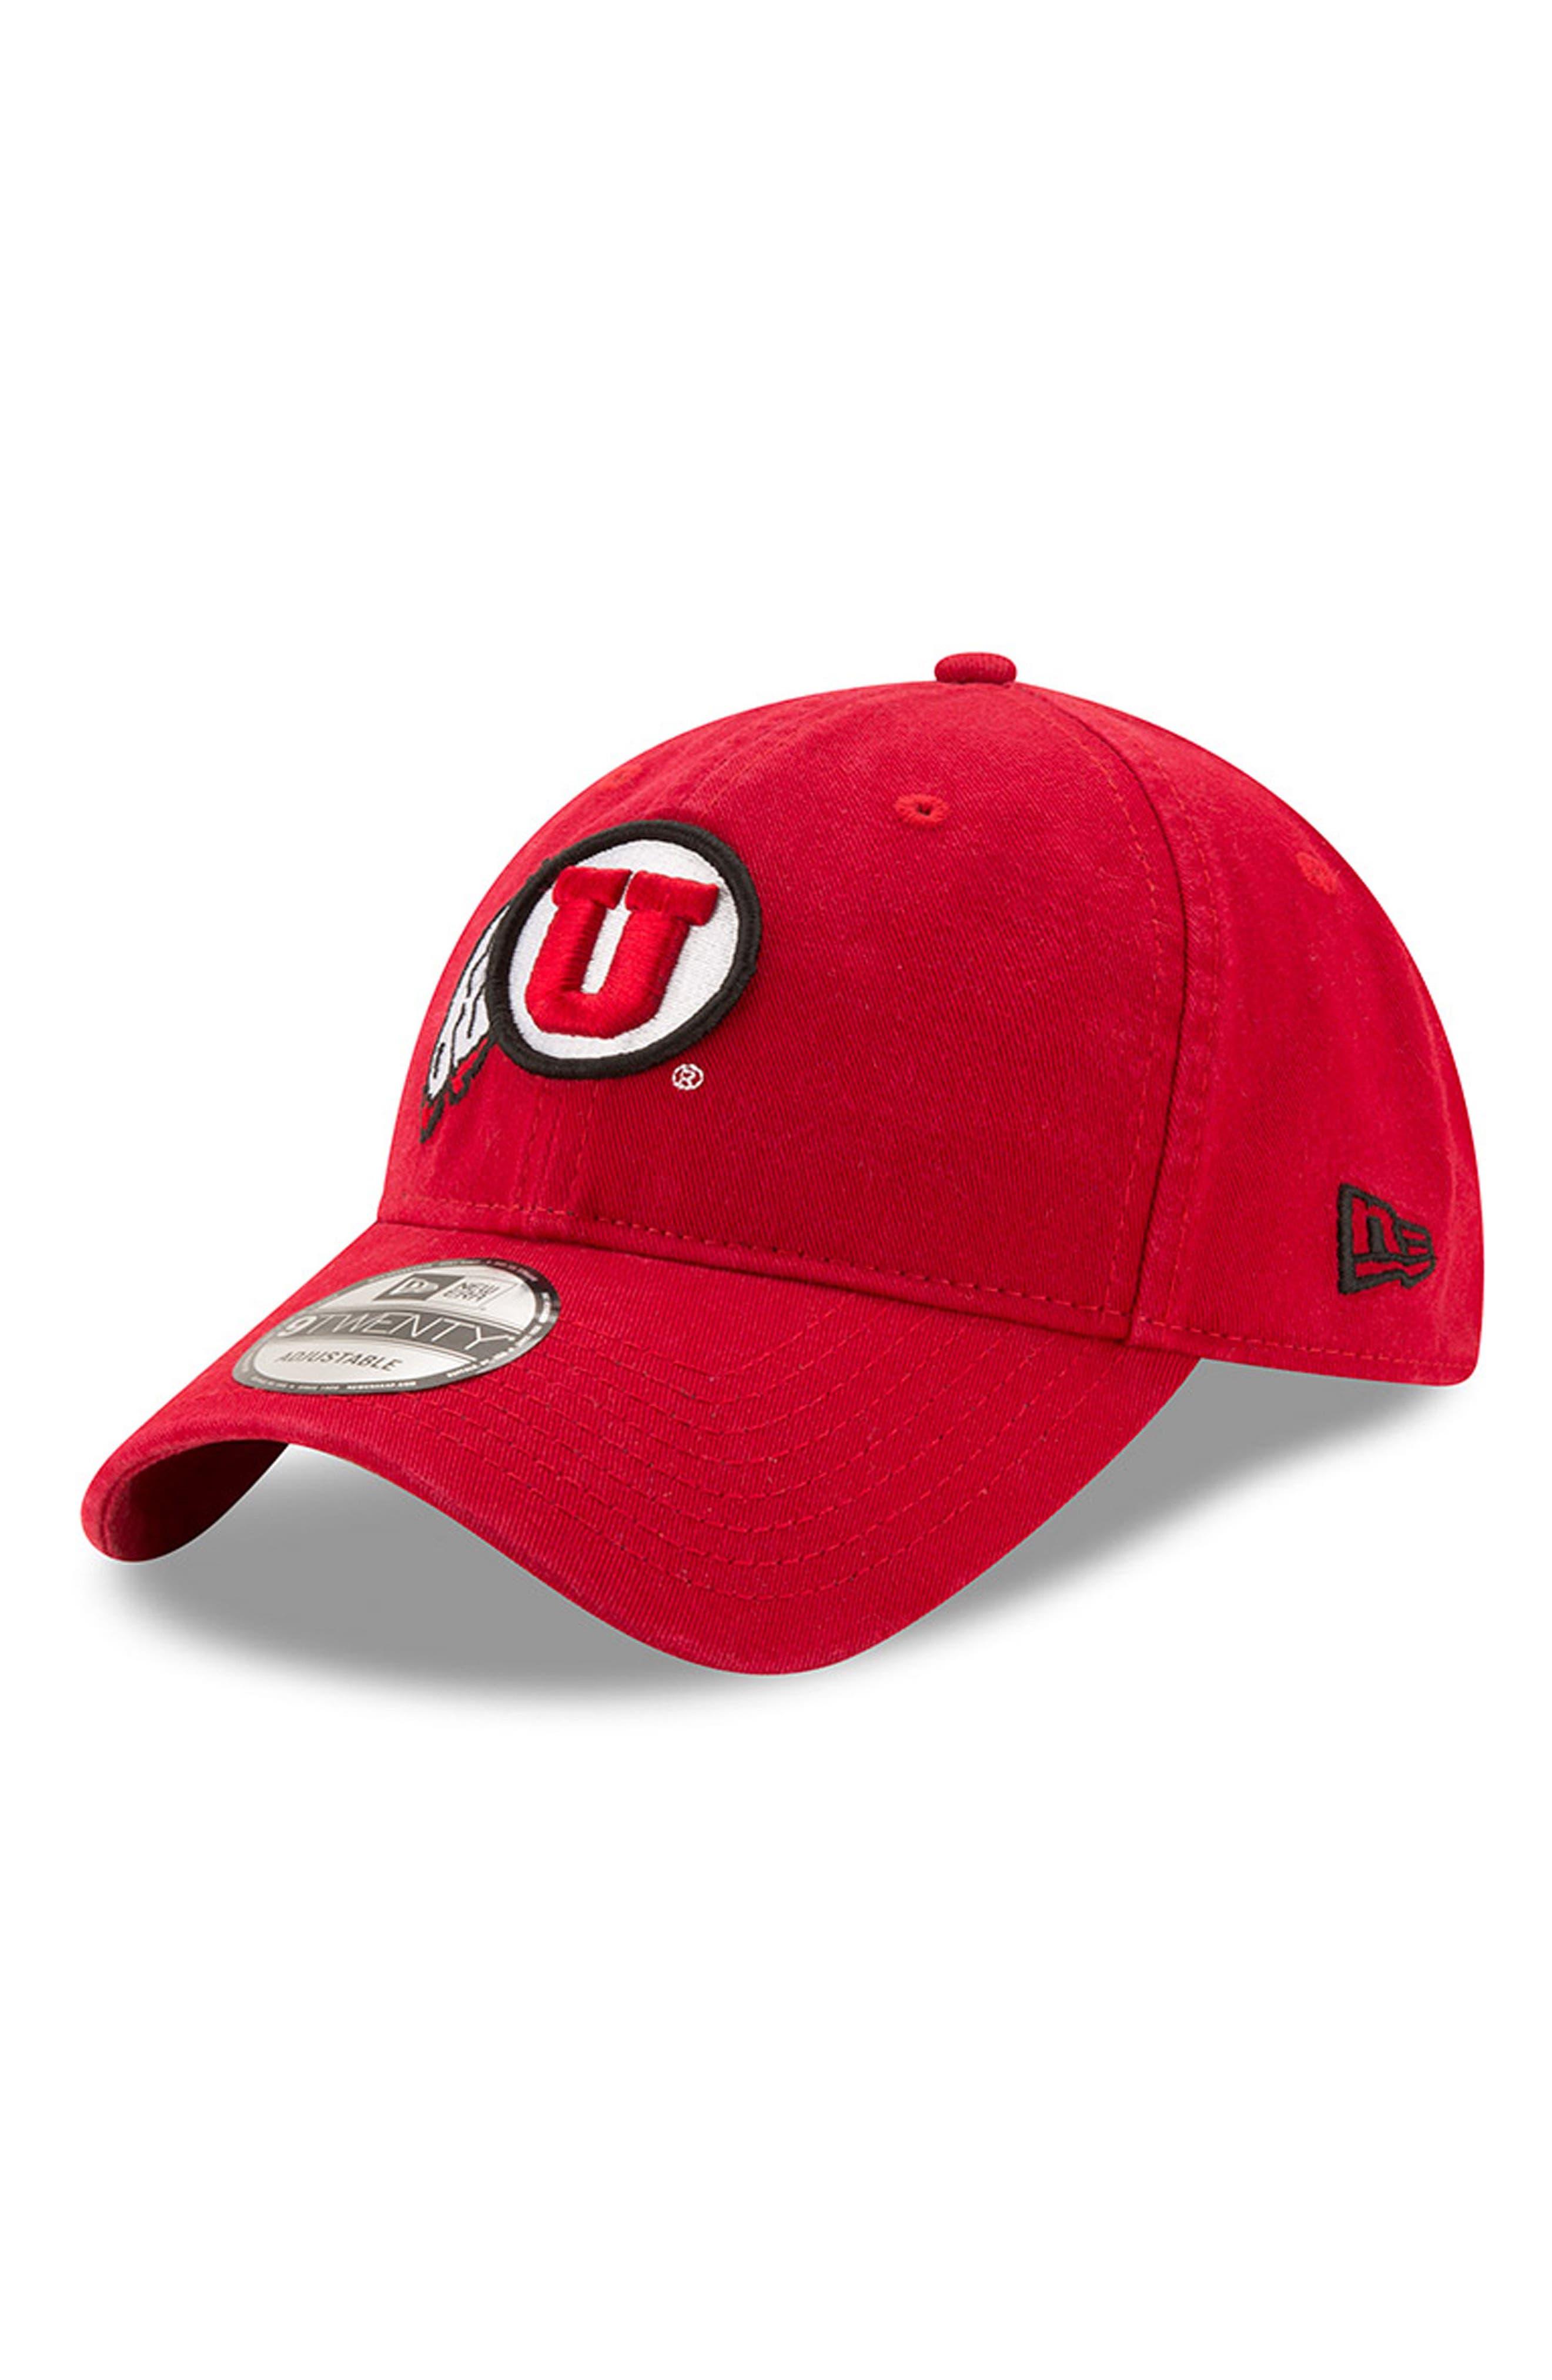 New Era Collegiate Core Classic - Utah Utes Baseball Cap,                             Main thumbnail 1, color,                             600